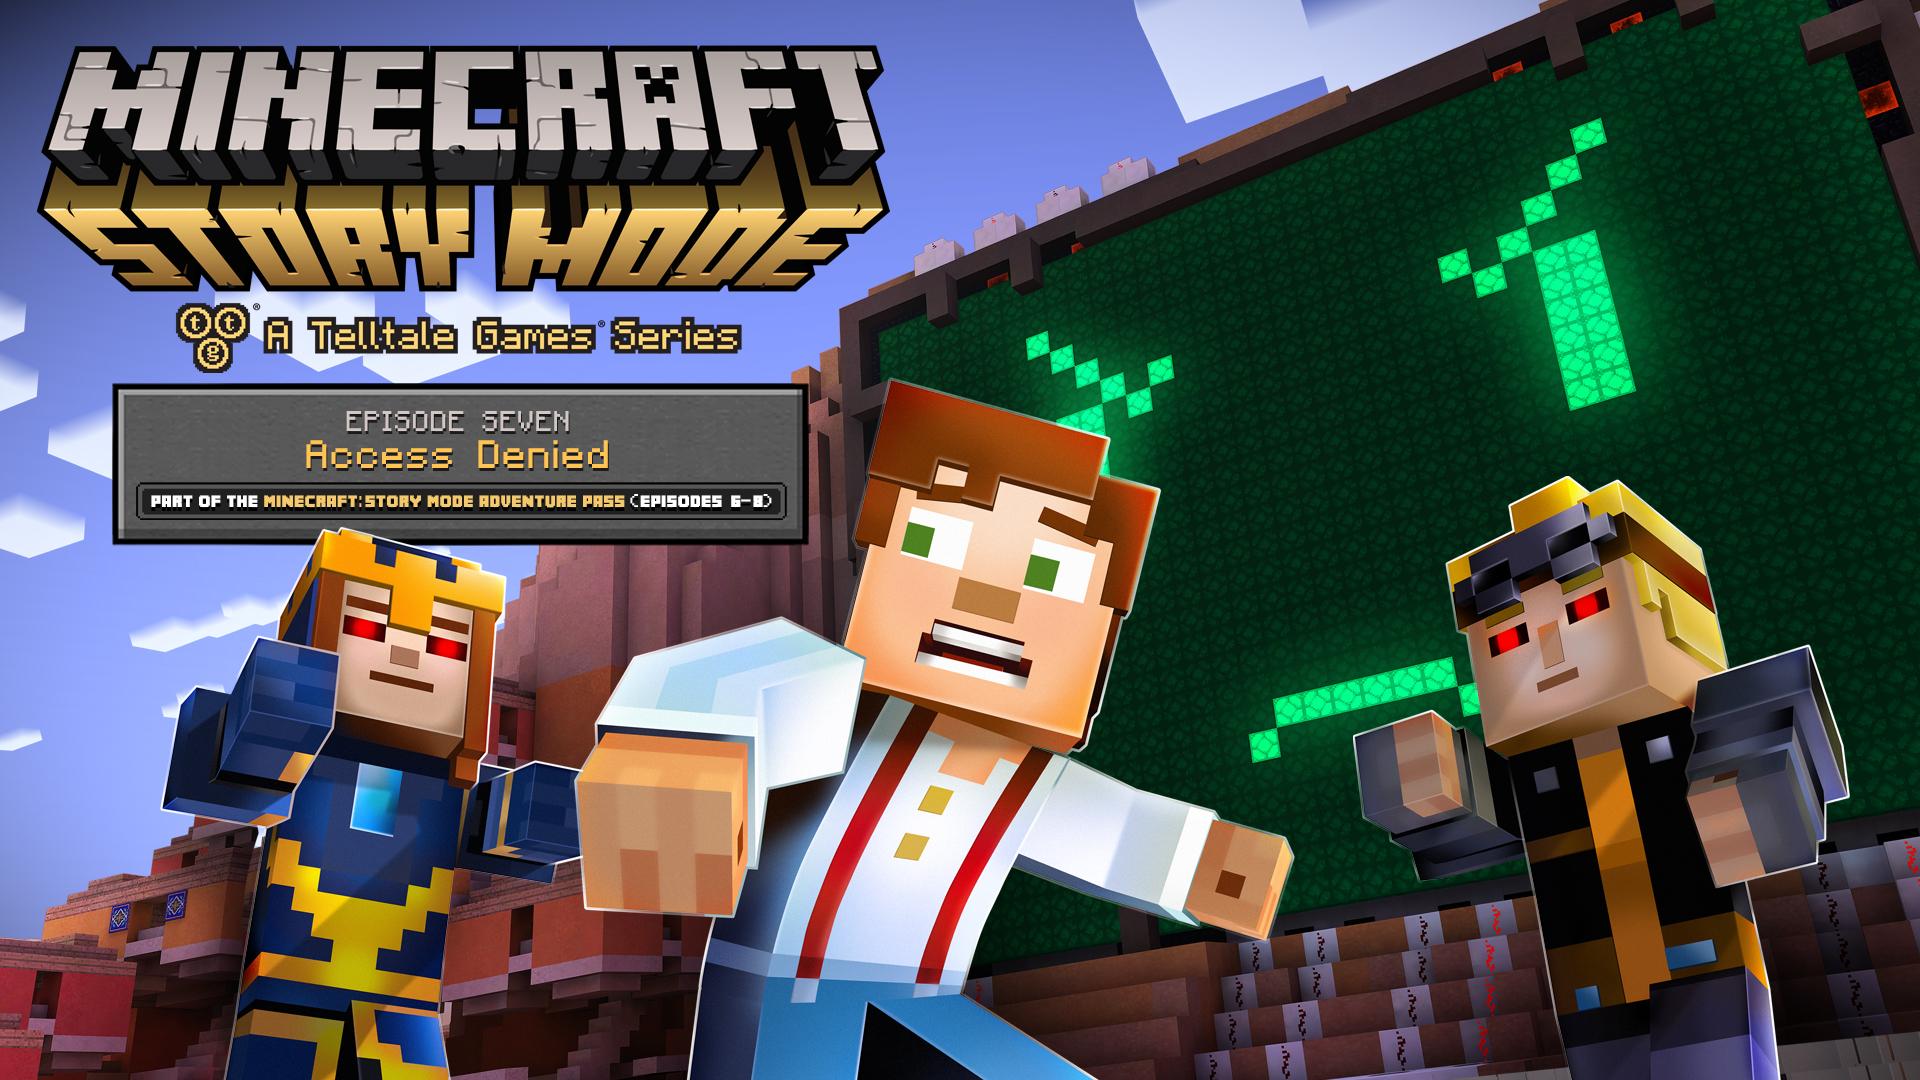 Minecraft: Story Mode - Adventure Pass £2.75 (PC/Mac) @ GamersGate